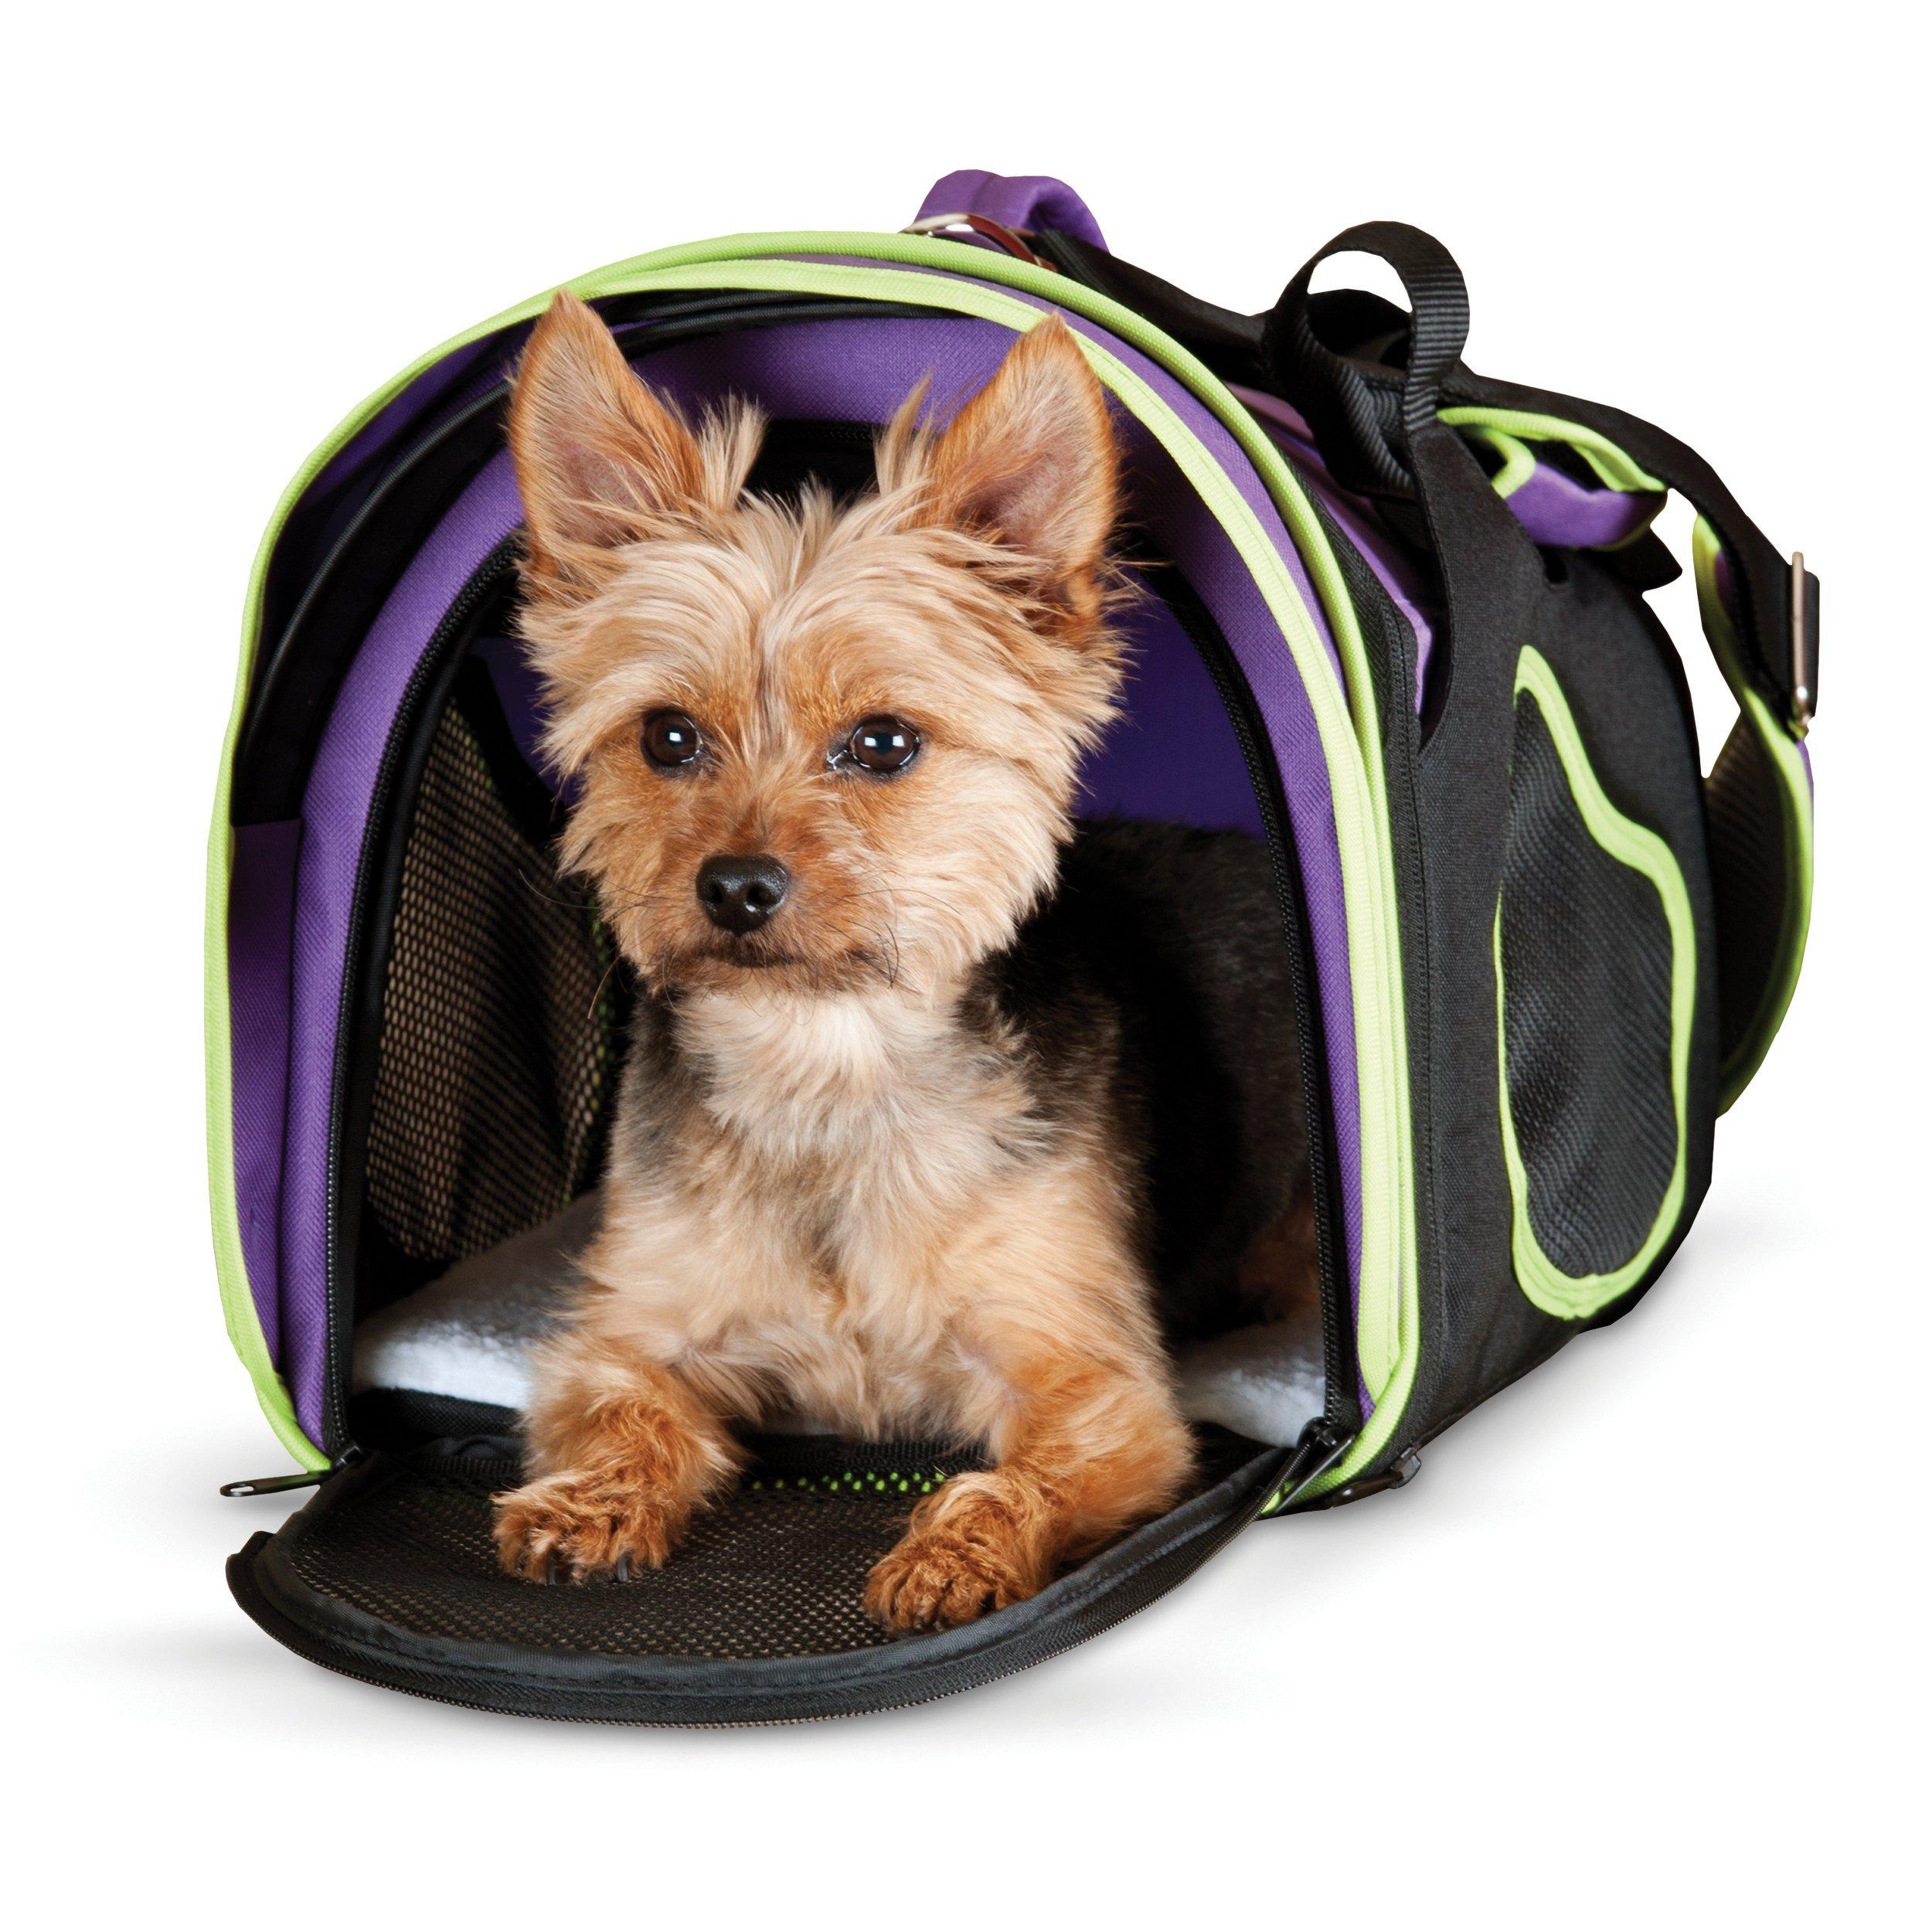 K&H Pet Products Comfy Go Pet Carrier Purple/Black/Lime Green X-Large 21'' x 12'' x 12.5''